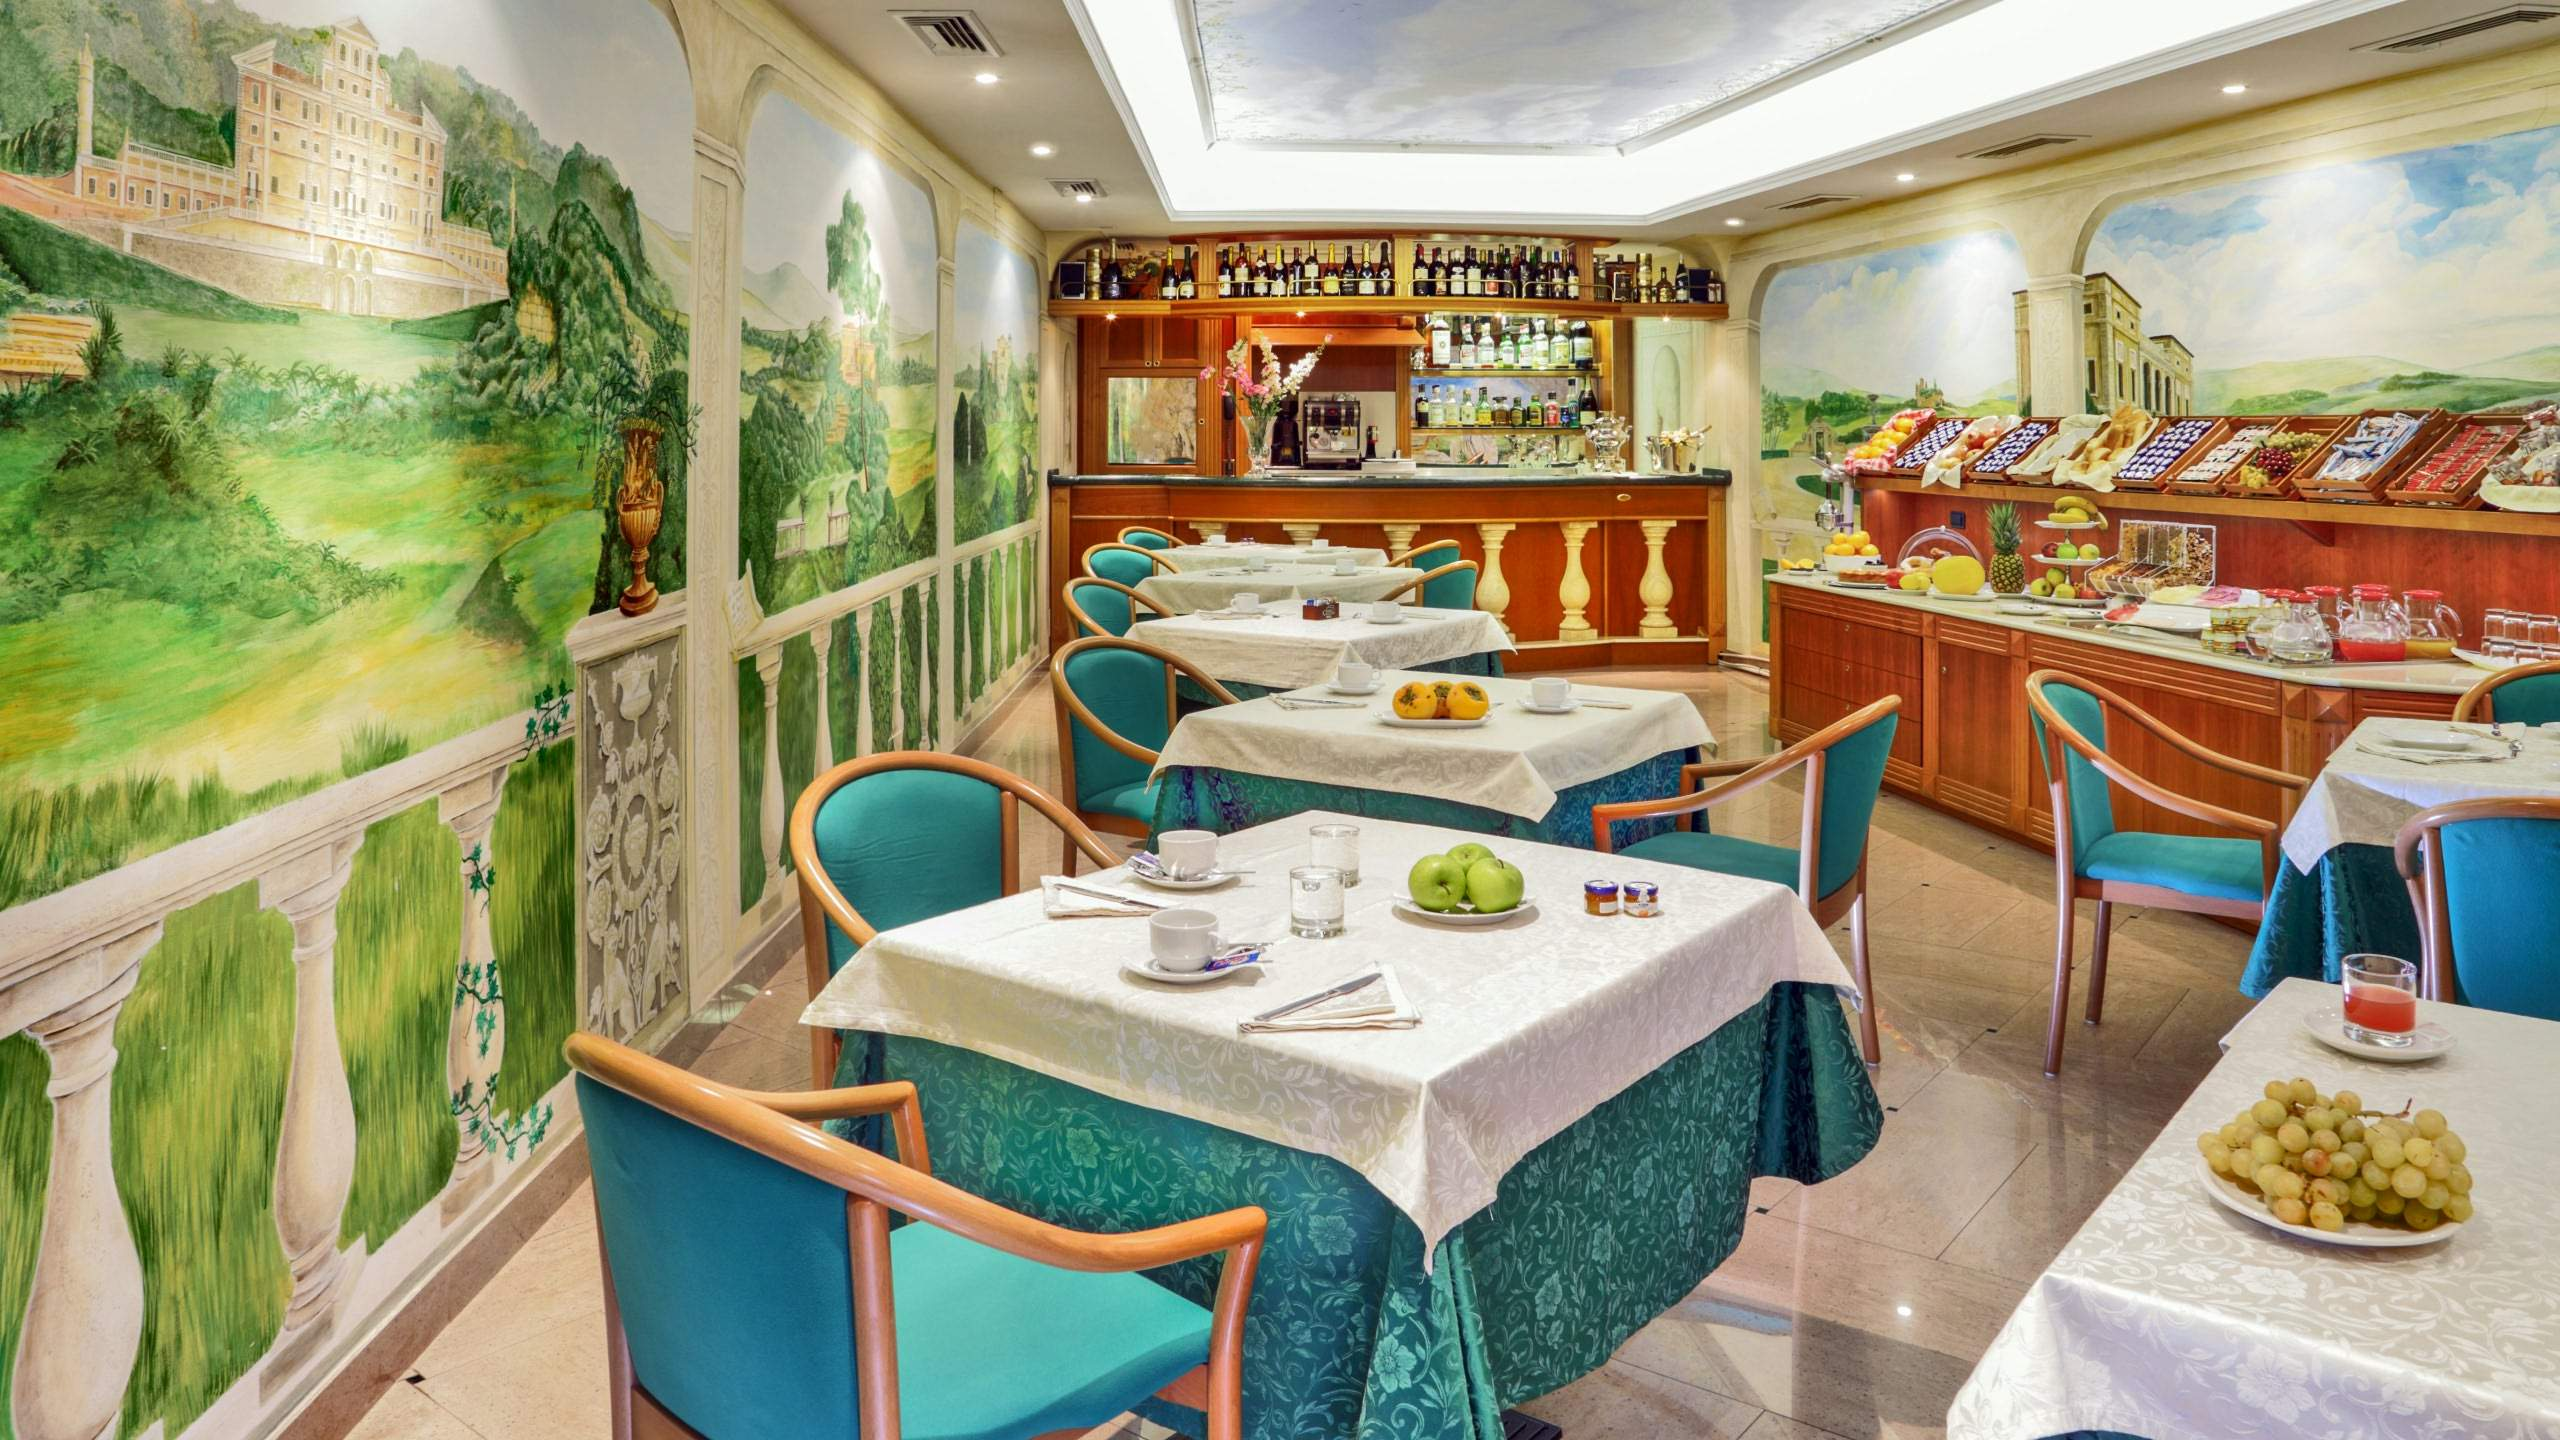 Hotel-Colonna-Frascati-breakfast-room-20